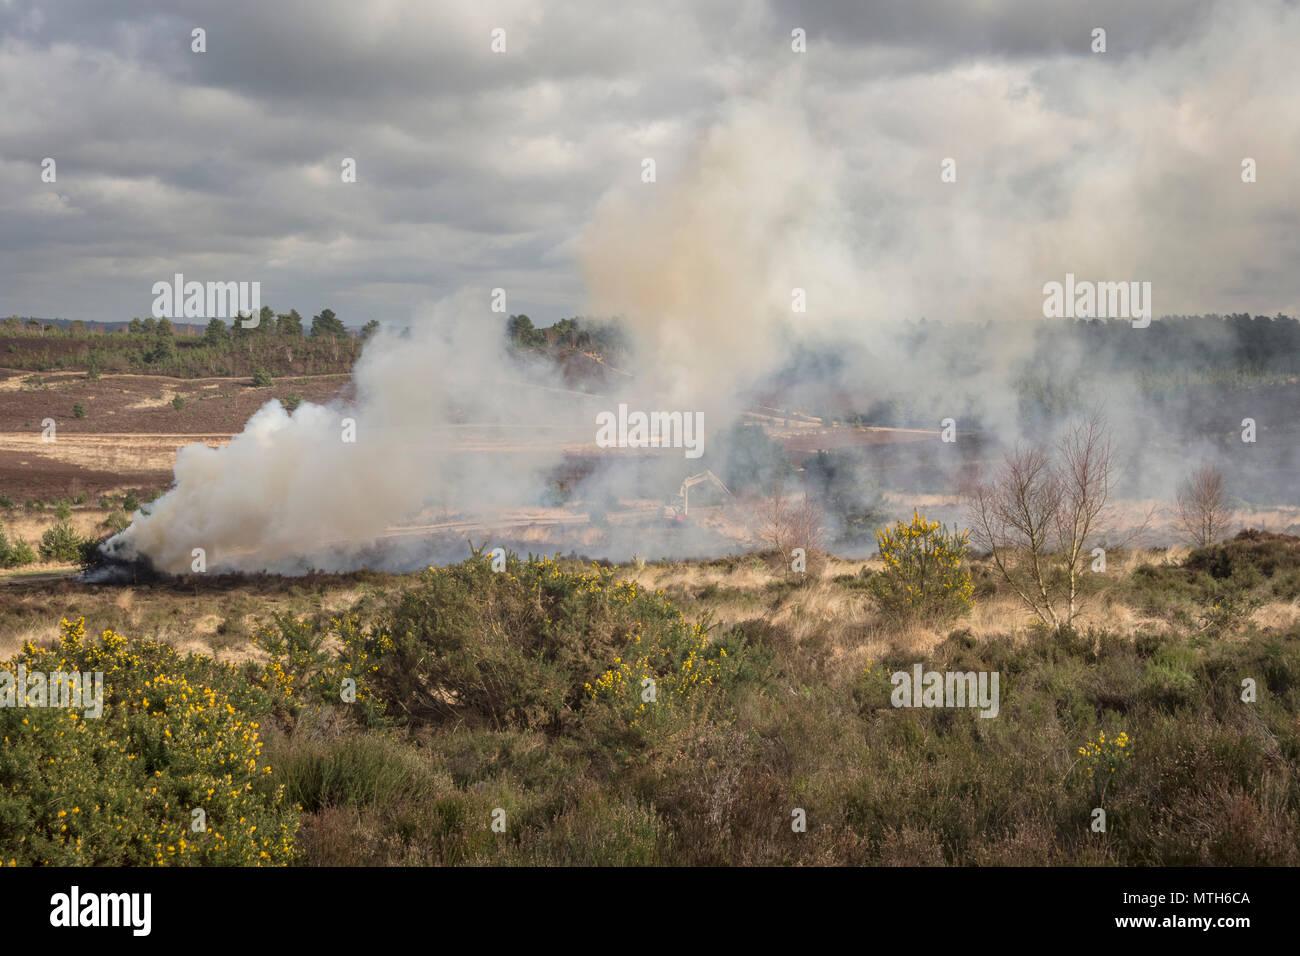 Scrub burning on Hankley Common in Surrey - Stock Image